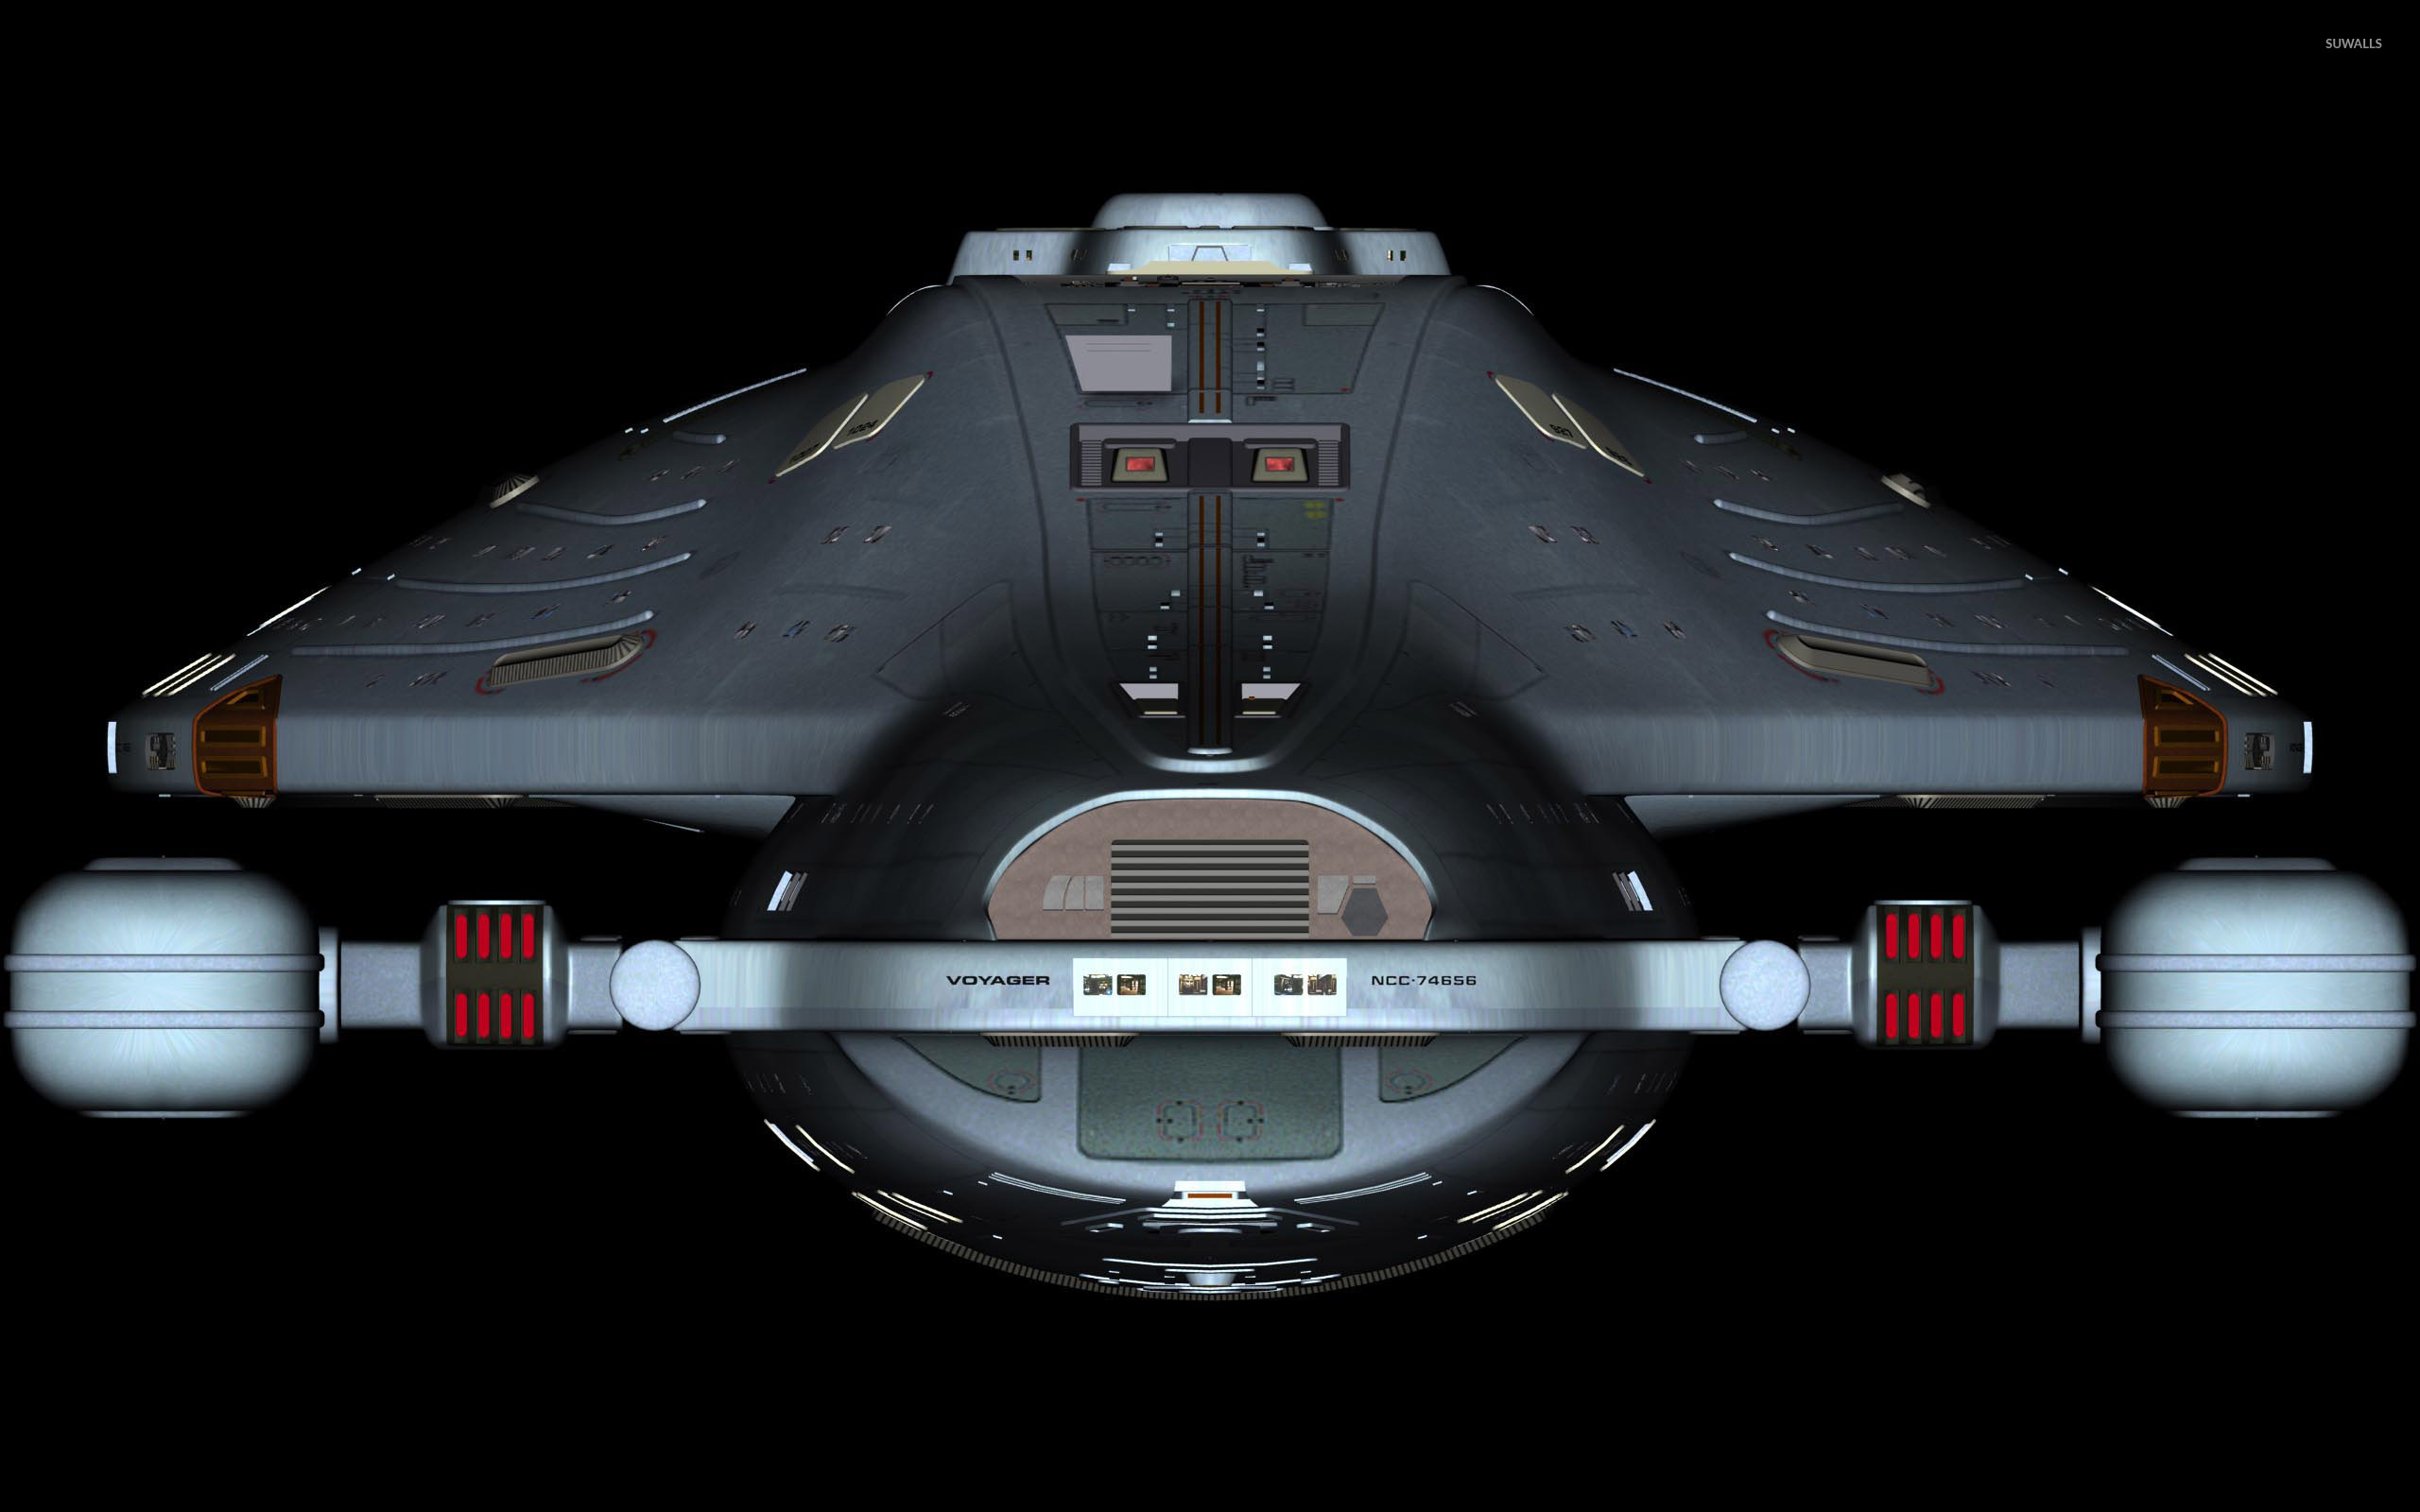 Uss Voyager Star Trek 4 Wallpaper Movie Wallpapers